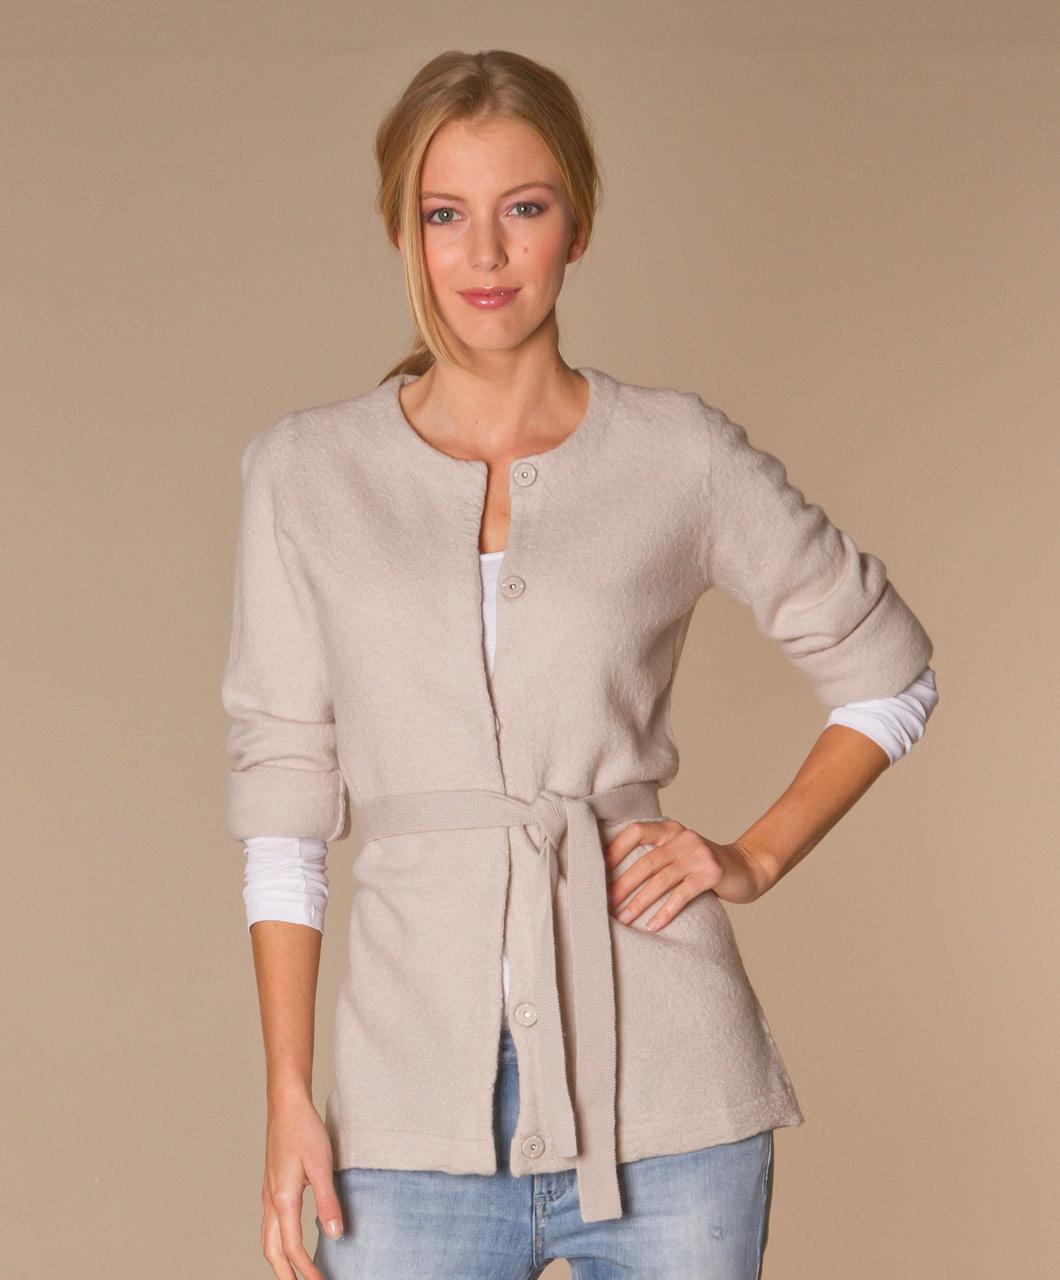 Handväska Filippa K : The look eindeloos chique perfectly basics